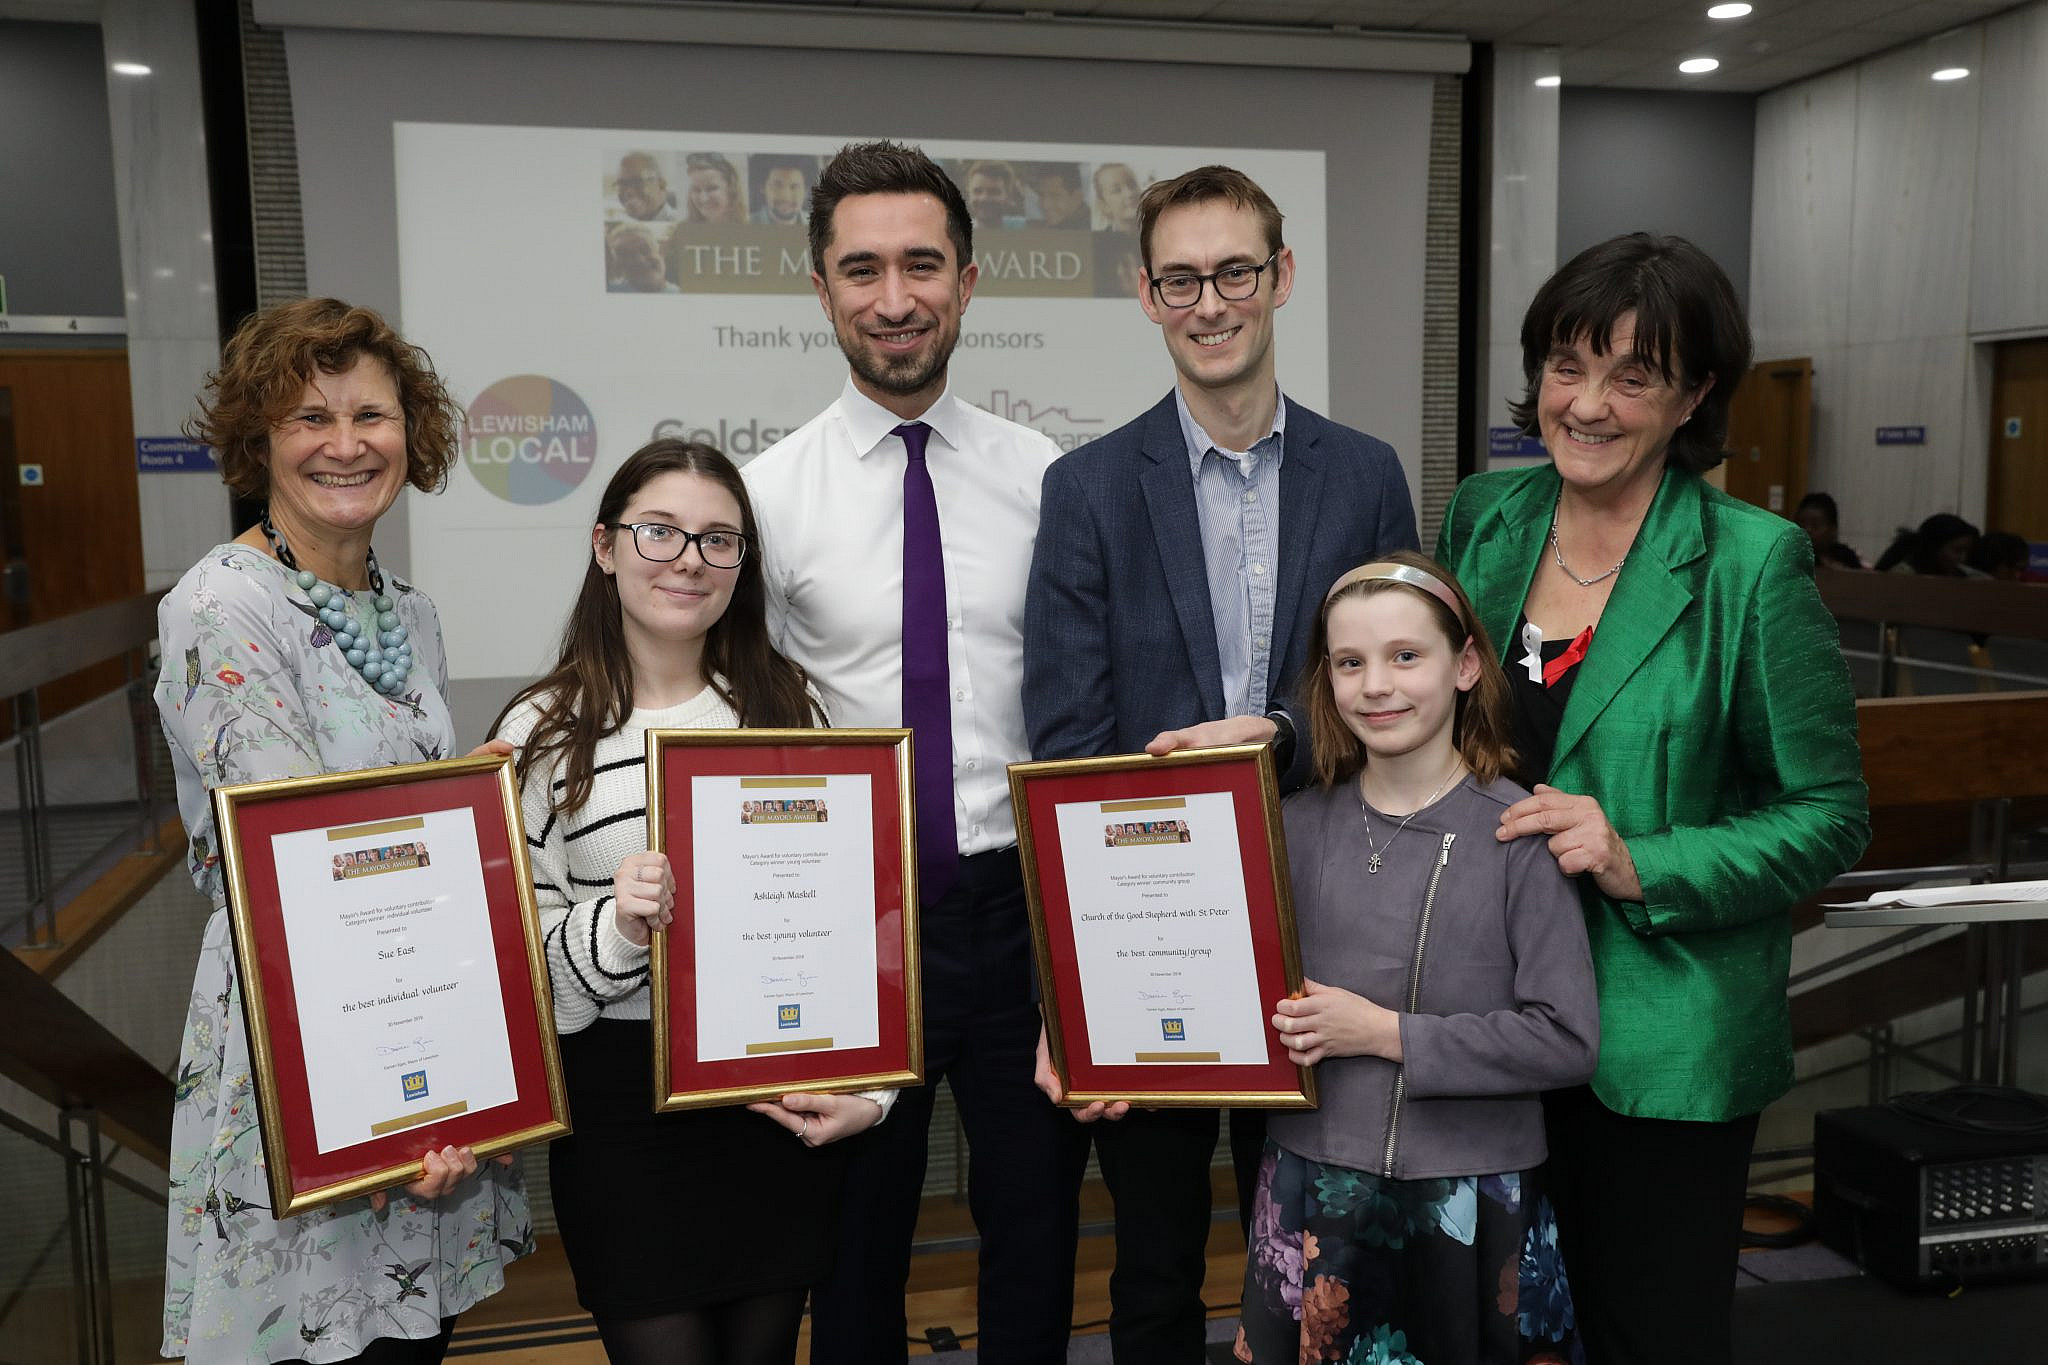 Mayors Awards For Volunteering 2018 Lewisham Local